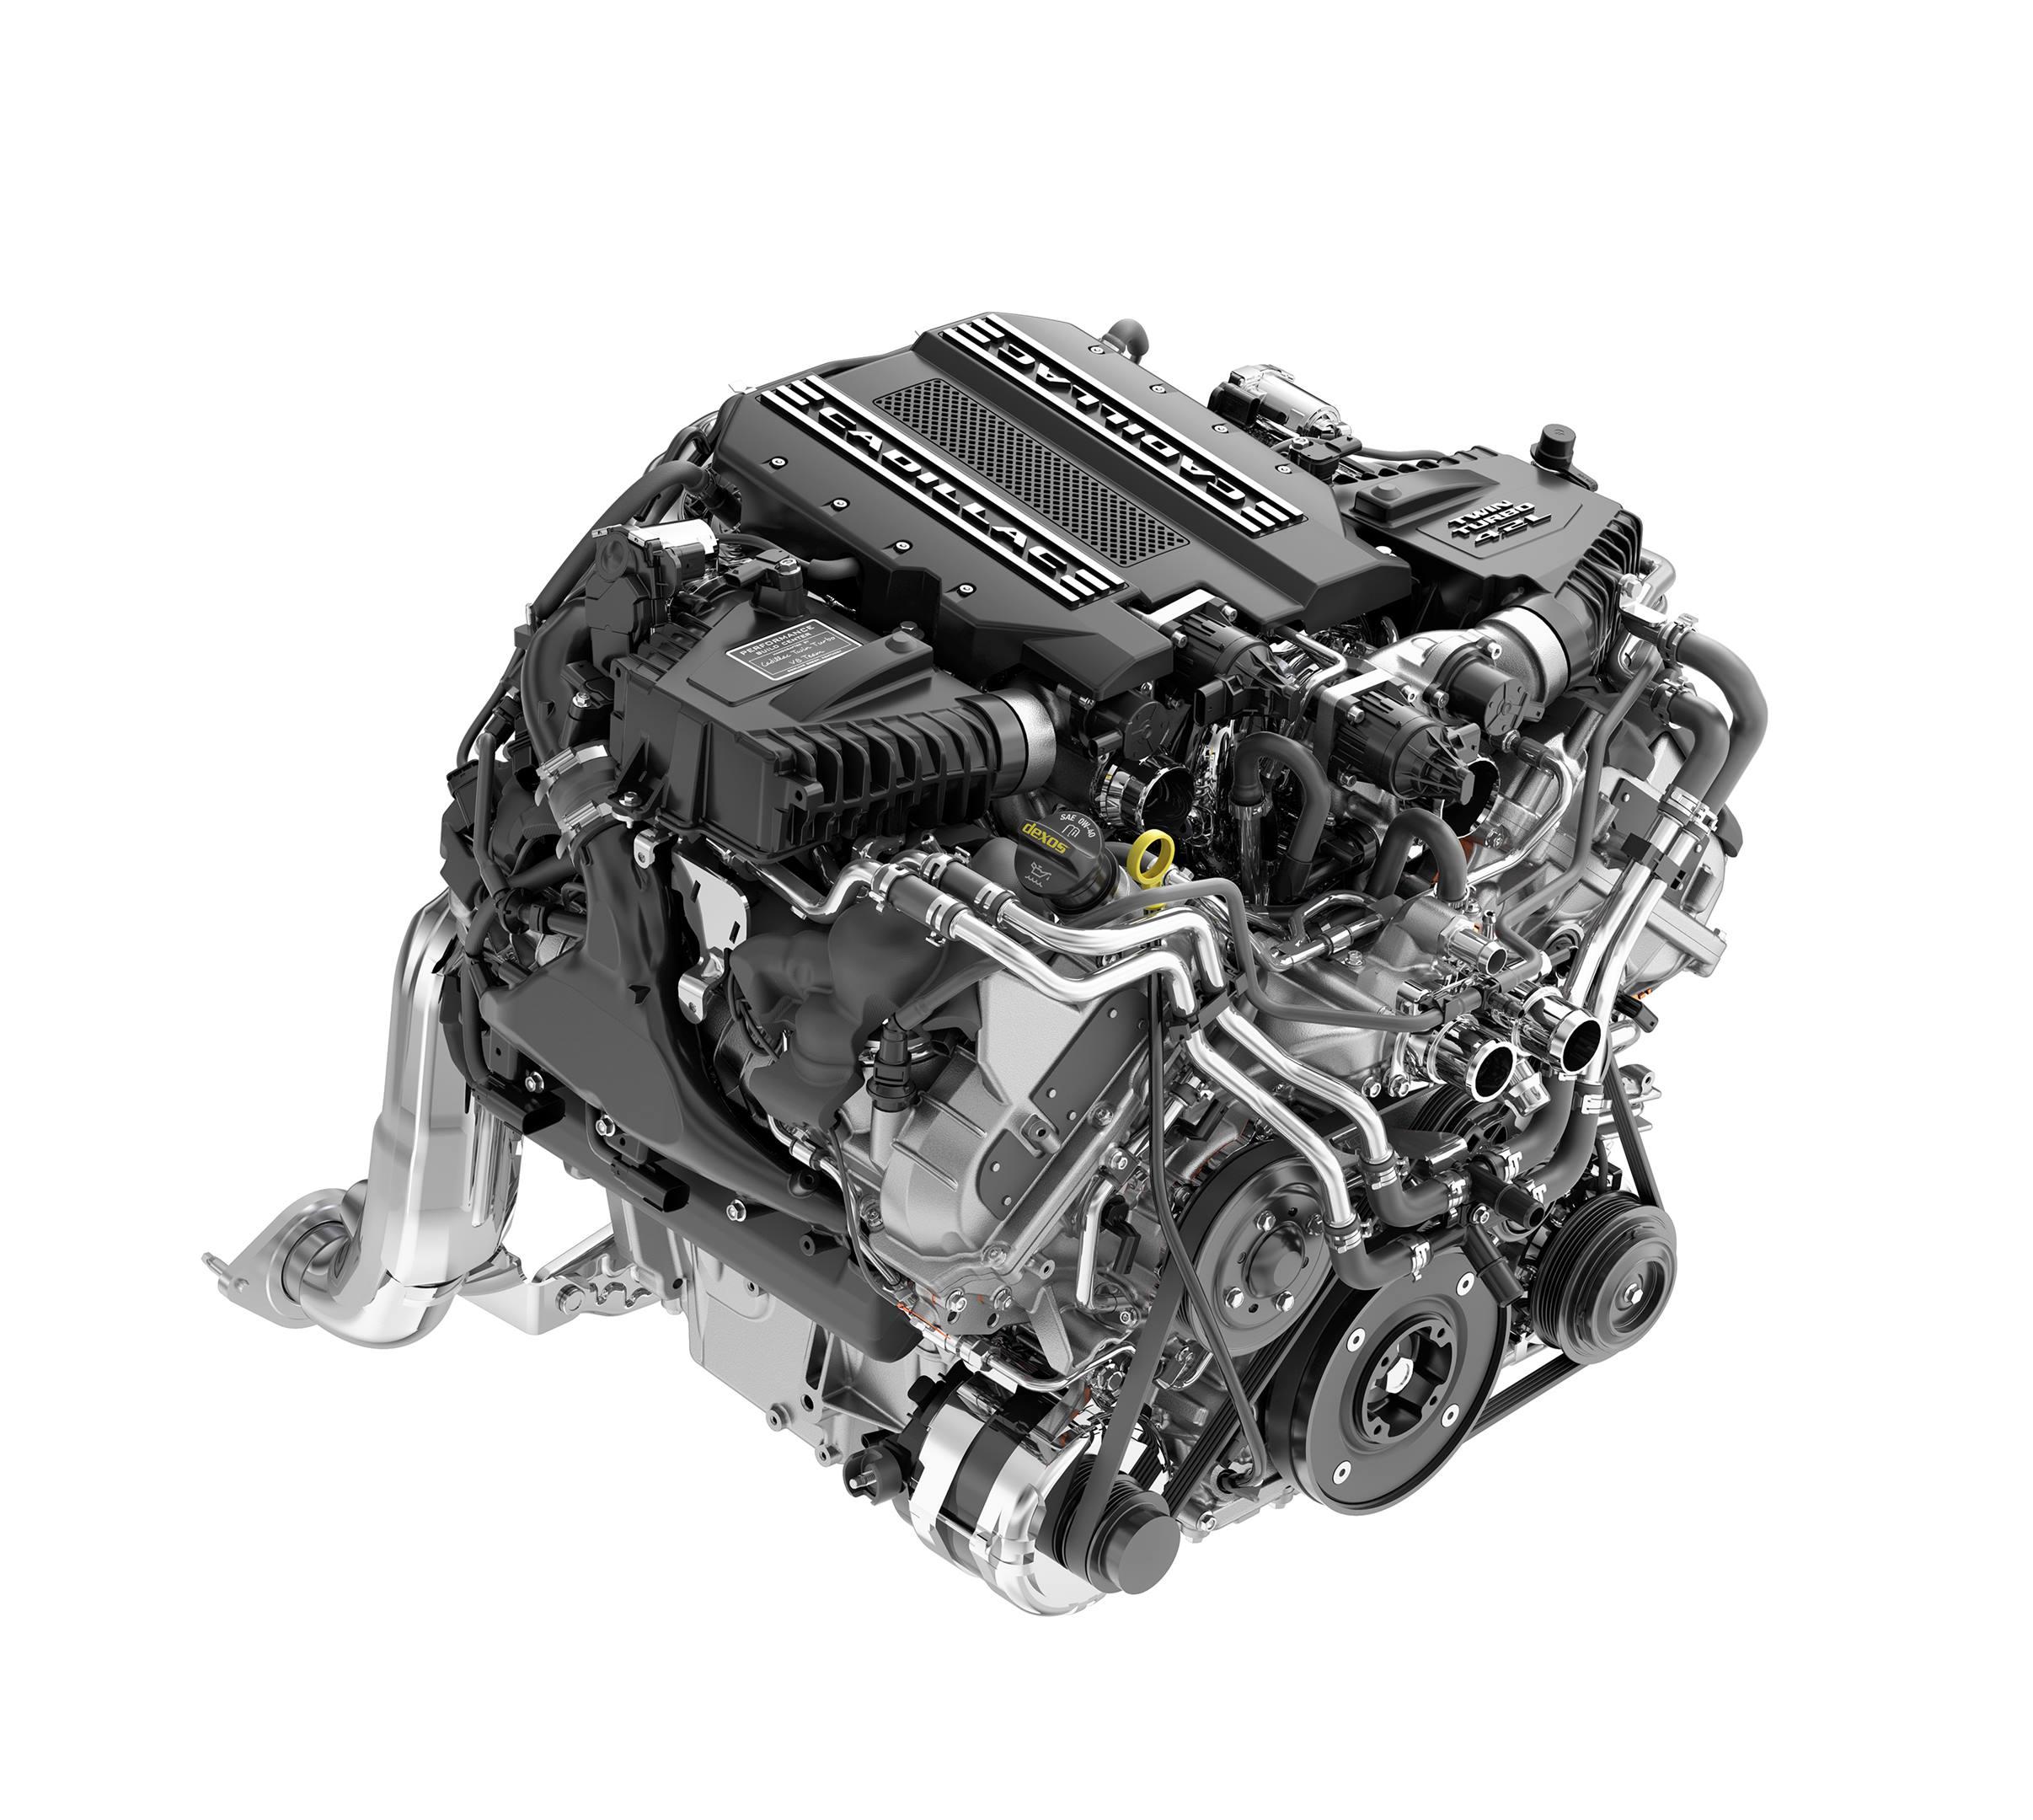 Cadillac twin-turbo V-8 engine